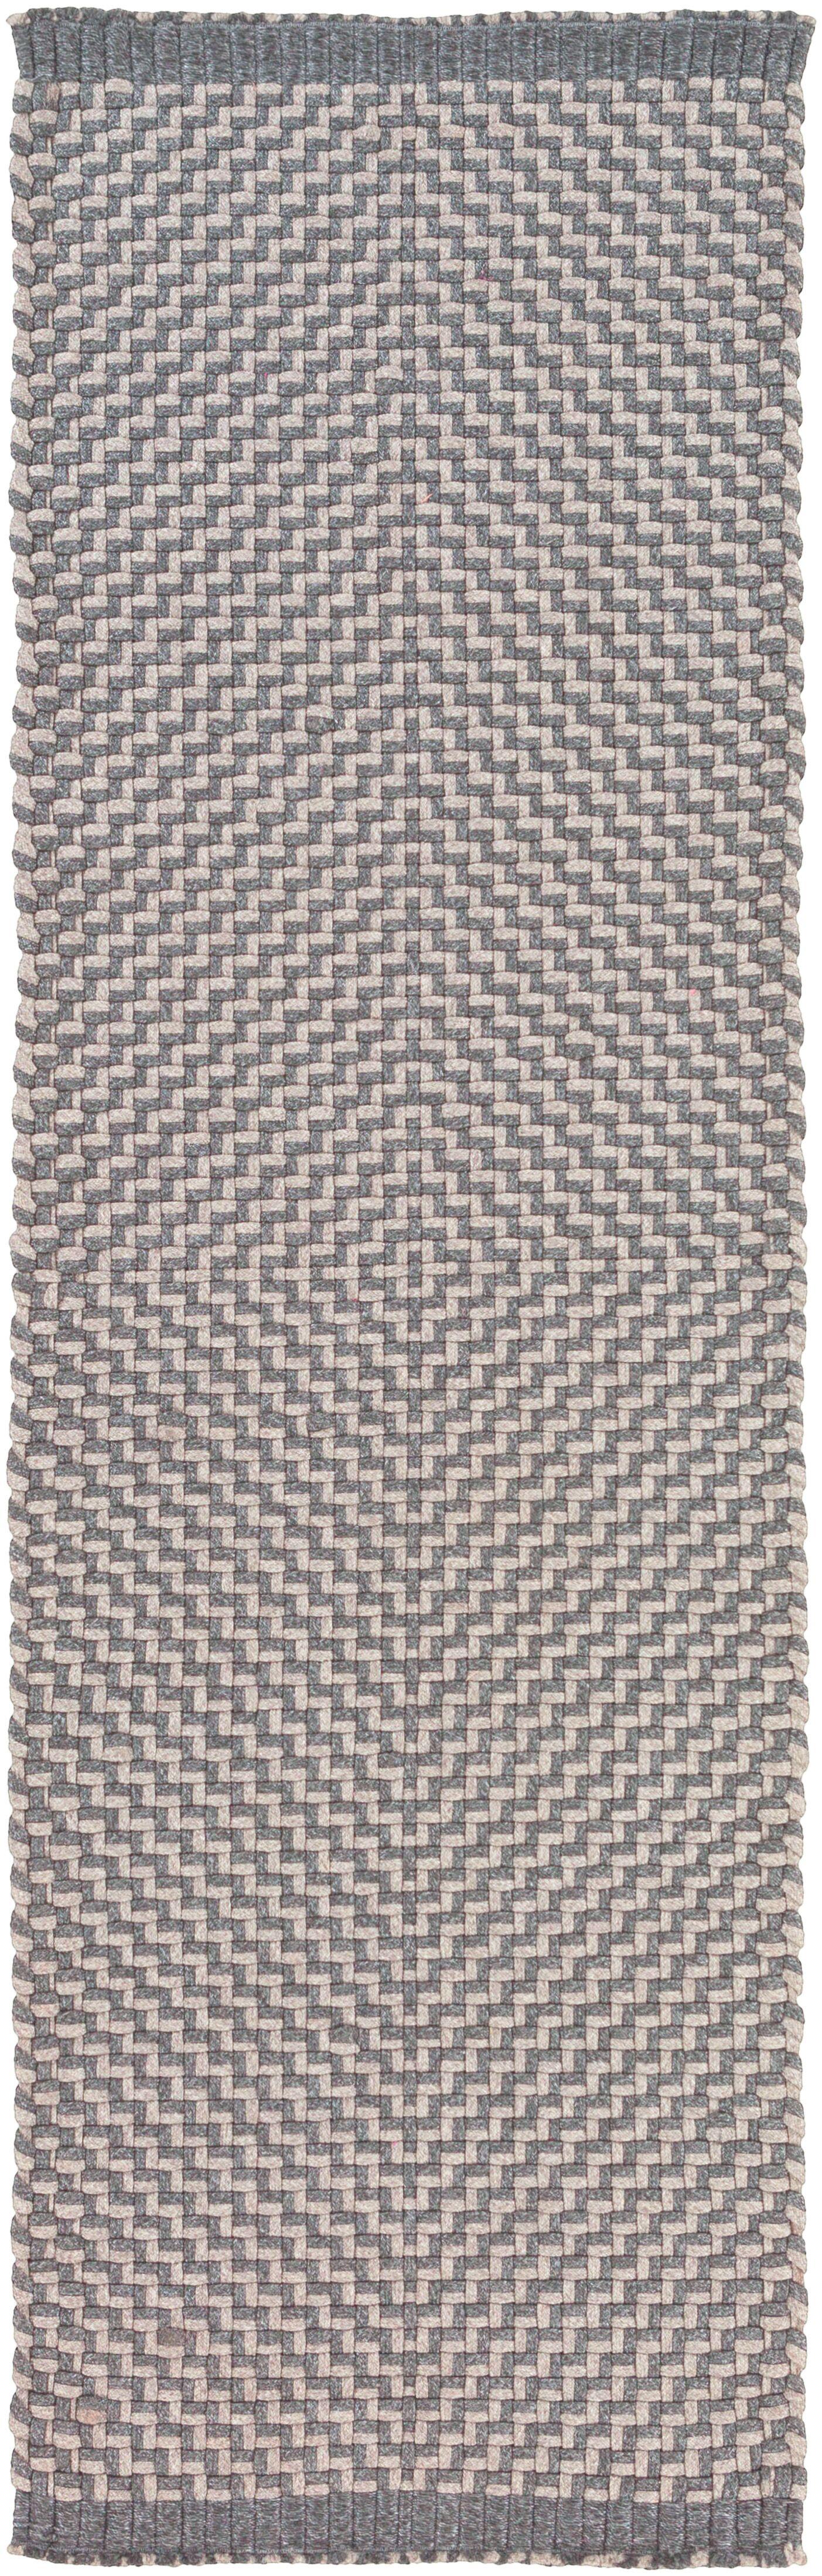 Walton Bay Hand-Woven Gray Indoor/Outdoor Area Rug Rug Size: Runner 2'6